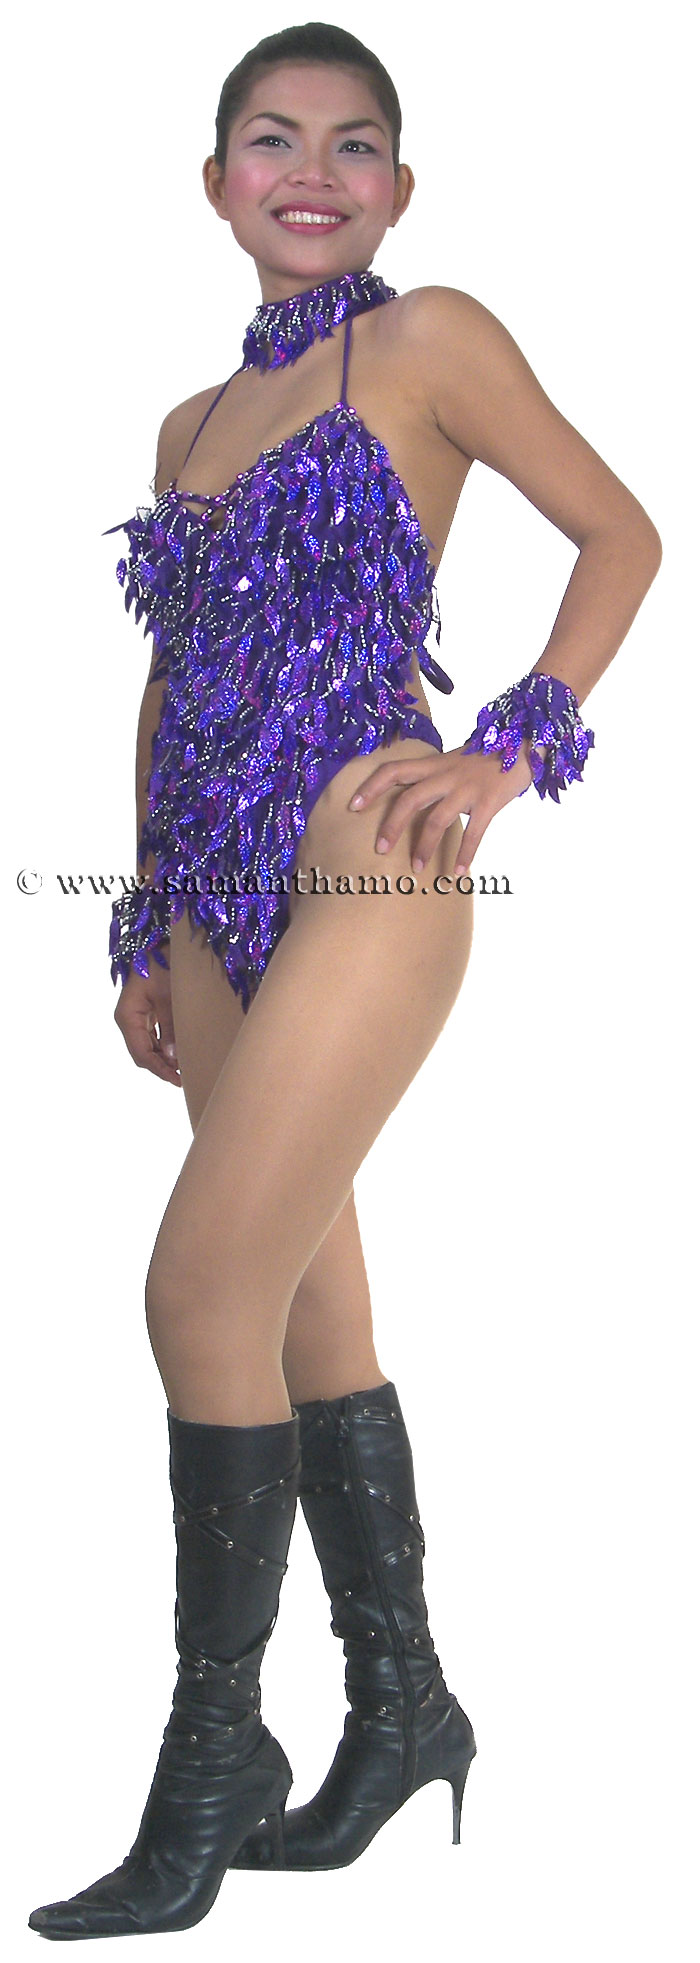 https://michaeljacksoncelebrityclothing.com/sequin-cabaret-clothing/RML355%20purple%20SPARKLING%20SEXY%20SEQUIN%20DANCE%20LEOTARD.jpg